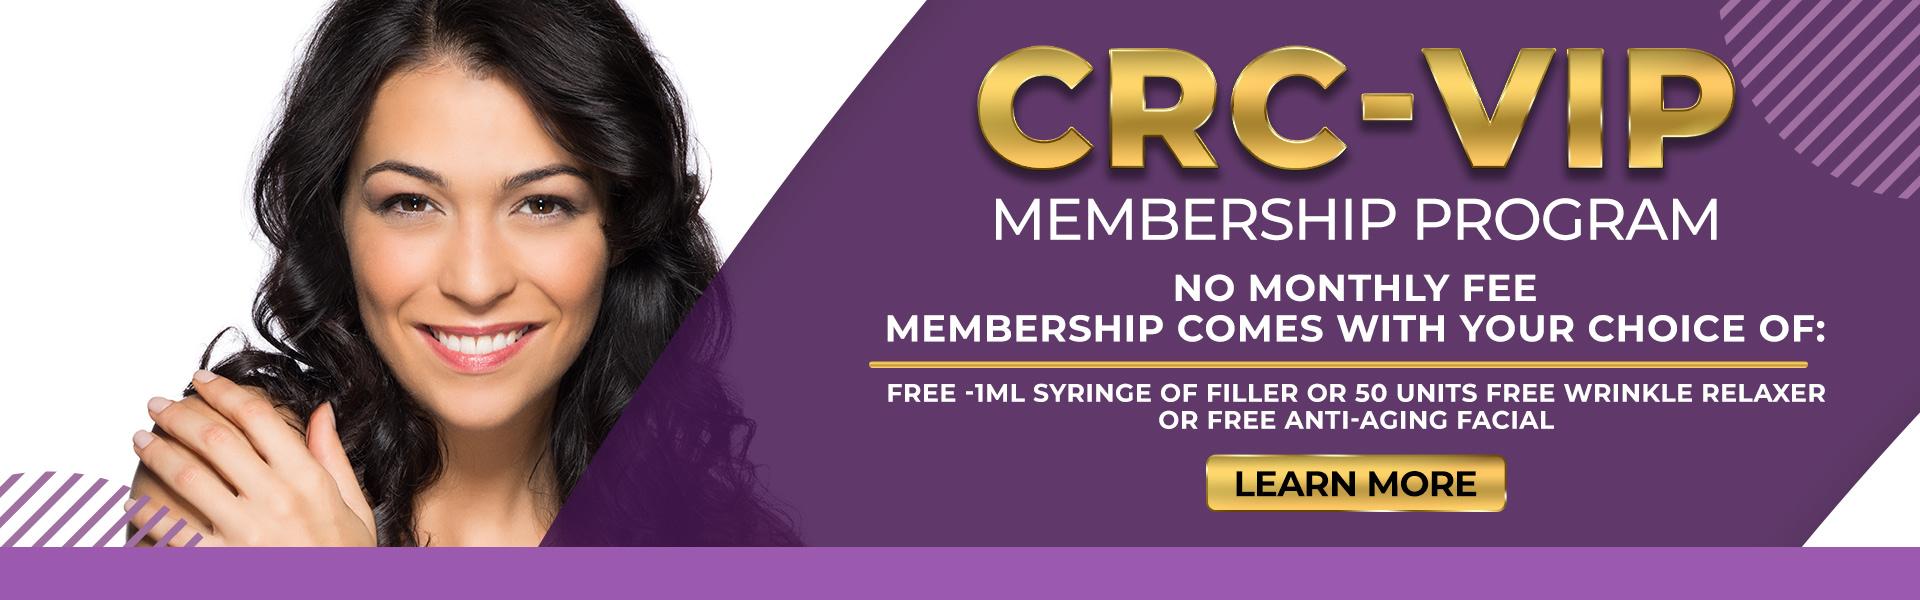 CRC-VIP Membership Program | Cosmetic Rejuvenation Center | Advanced Skin Care Clinic | Pepper Pike, OH